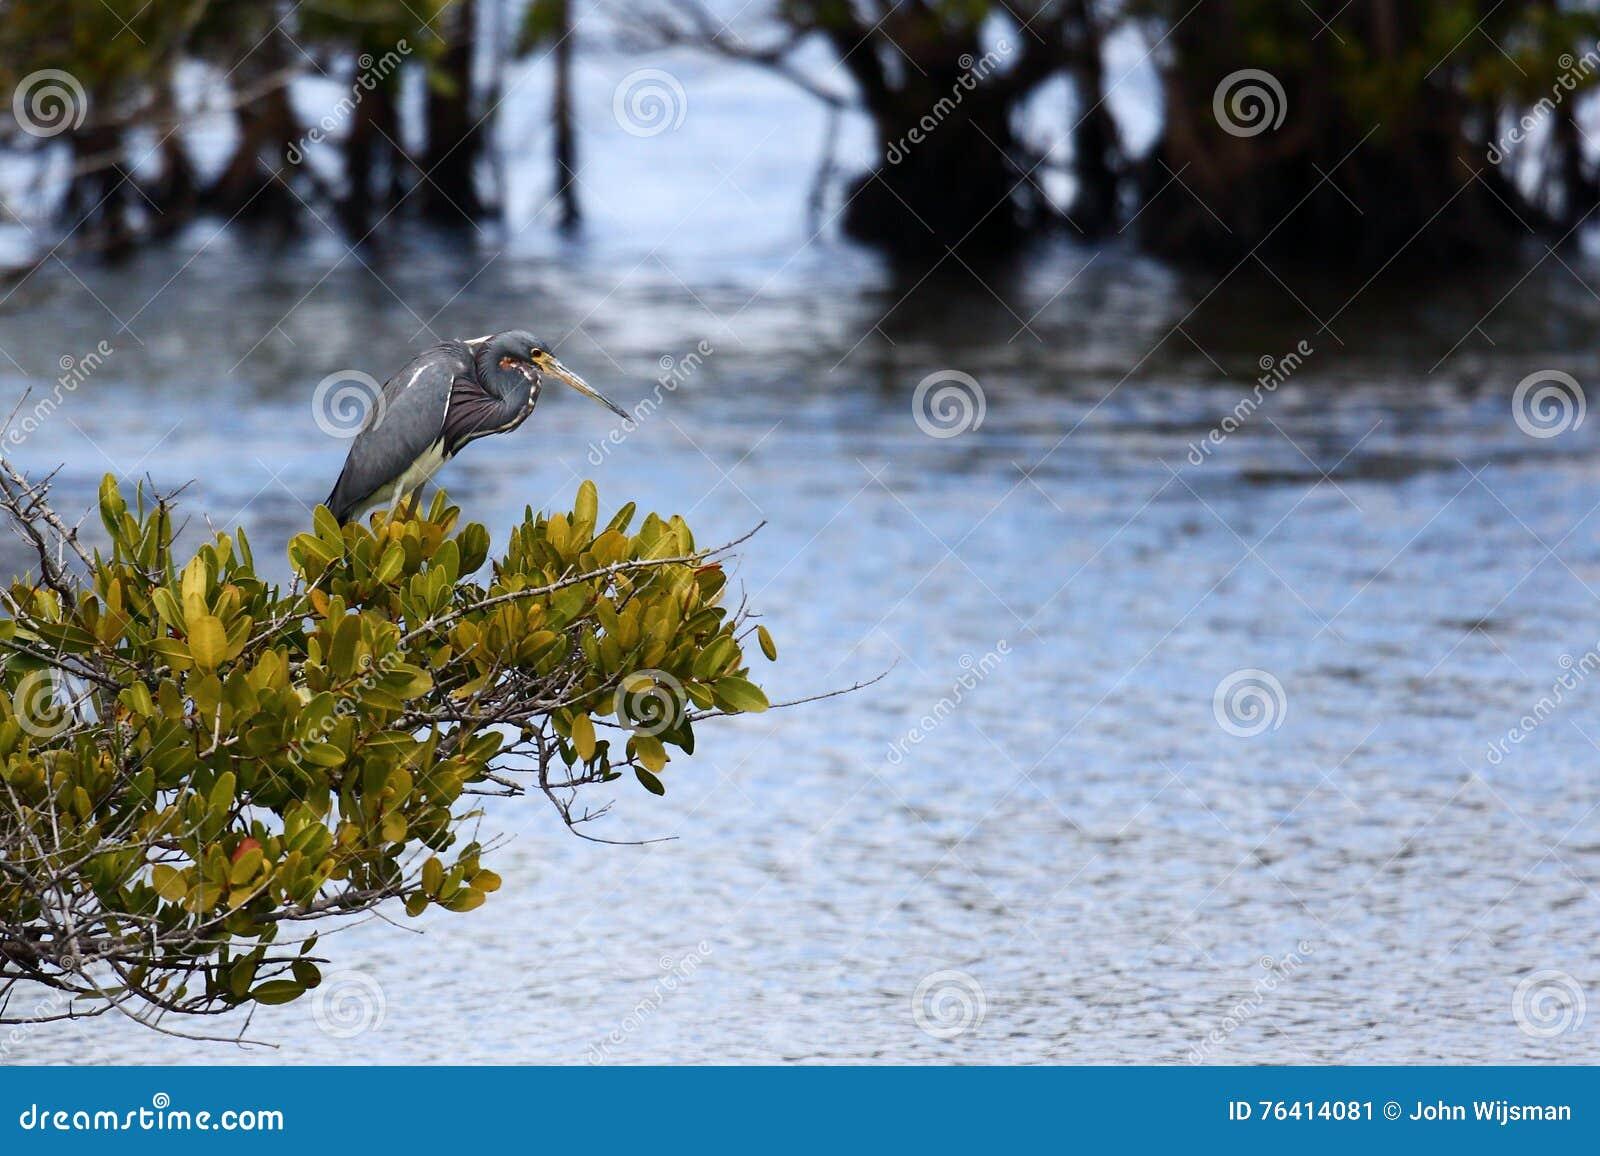 Трехцветная цапля стоя на кусте над болотом